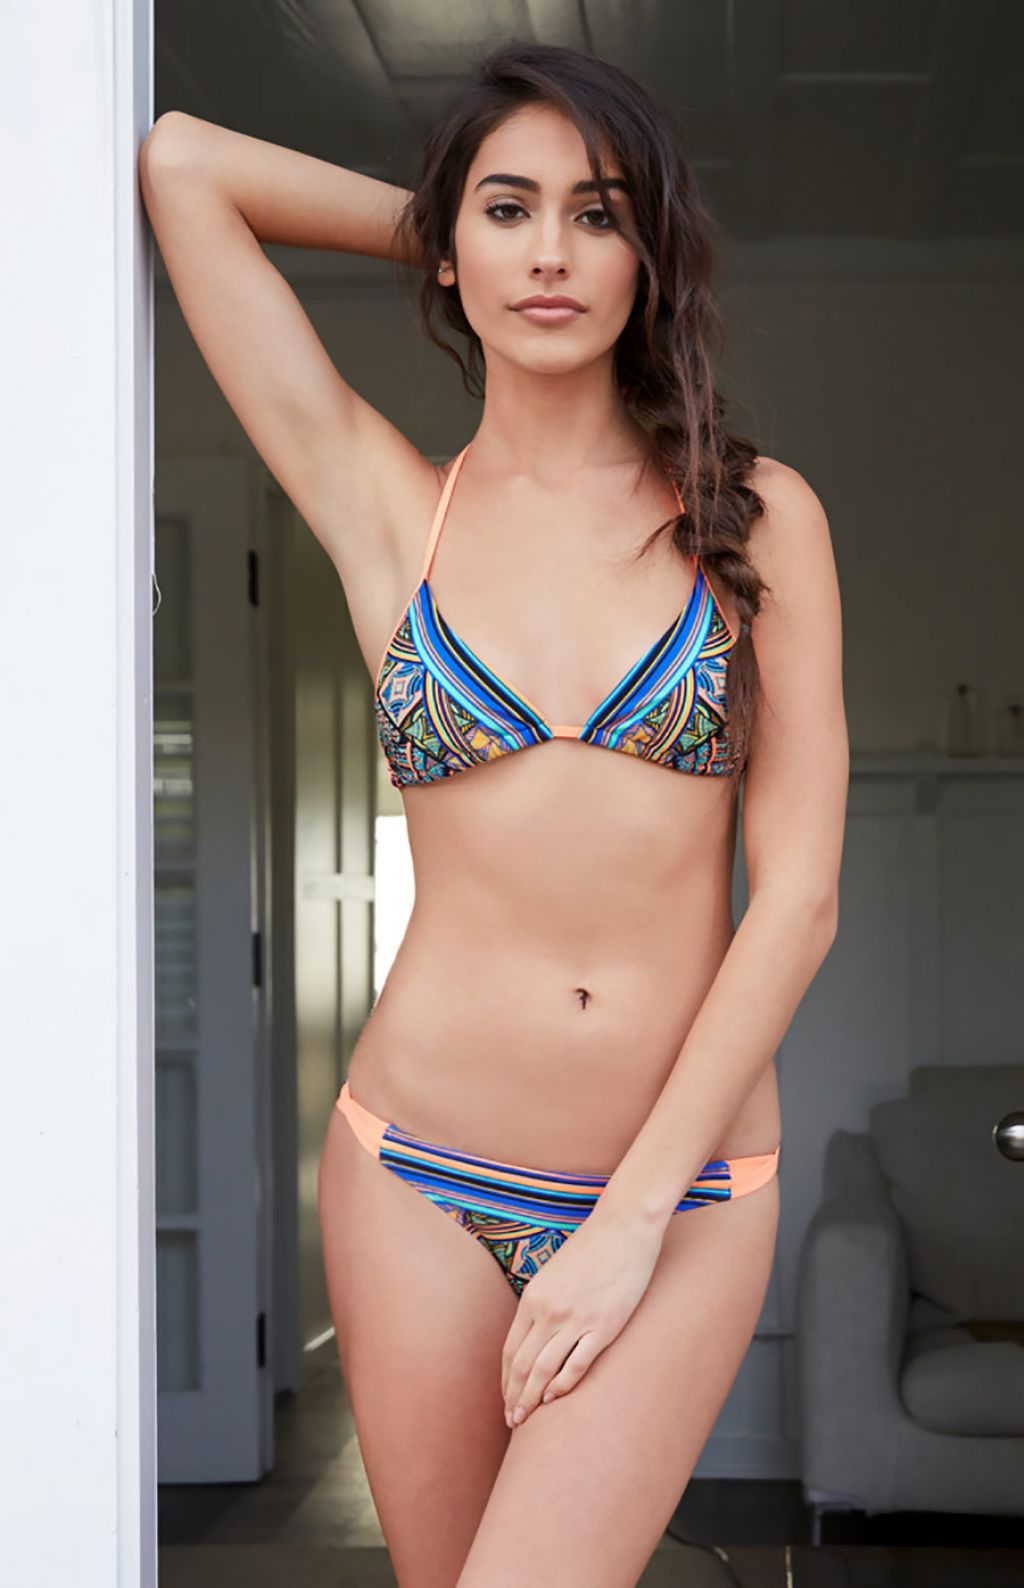 Taylor Hannum nude (26 photos), Tits, Bikini, Instagram, bra 2019